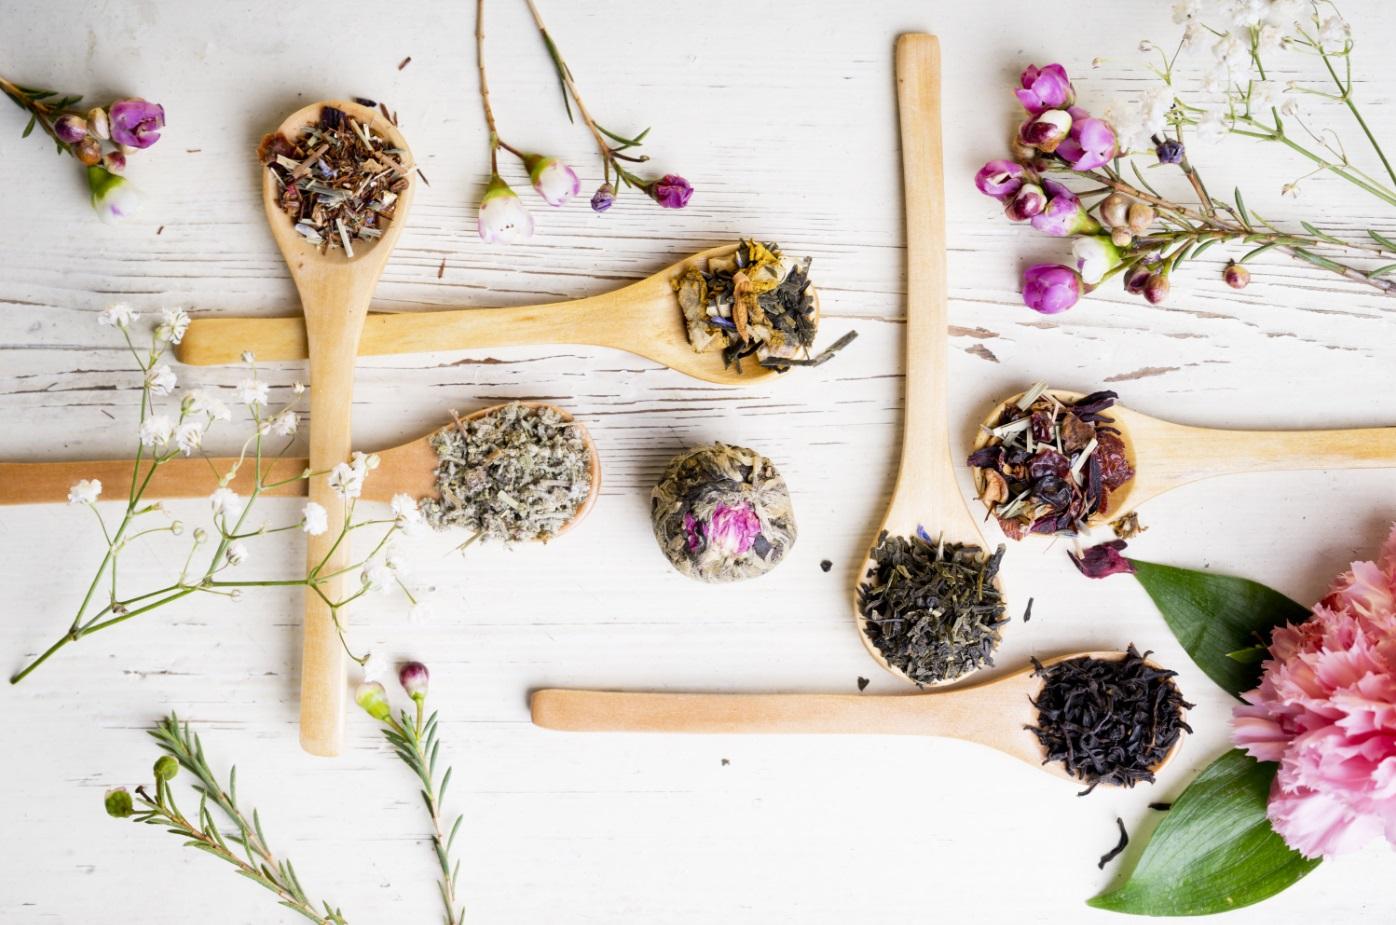 Organic Herbal Tea Recipe for Women